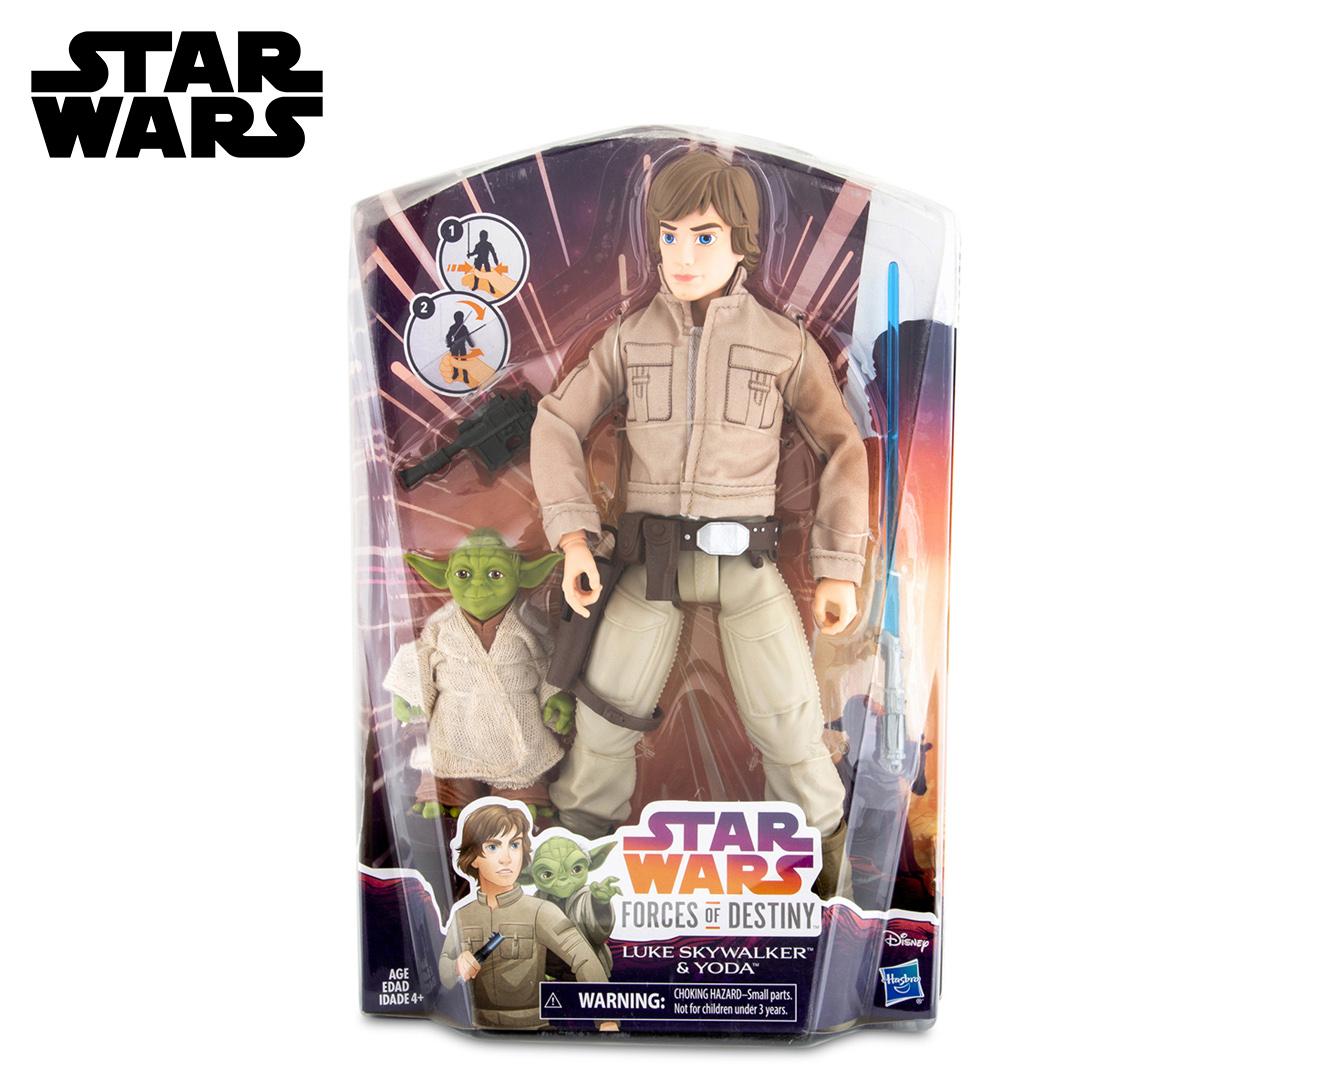 "Star Wars Forces of Destiny 11/"" Luke Skywalker and Yoda Adventure Figure Set"